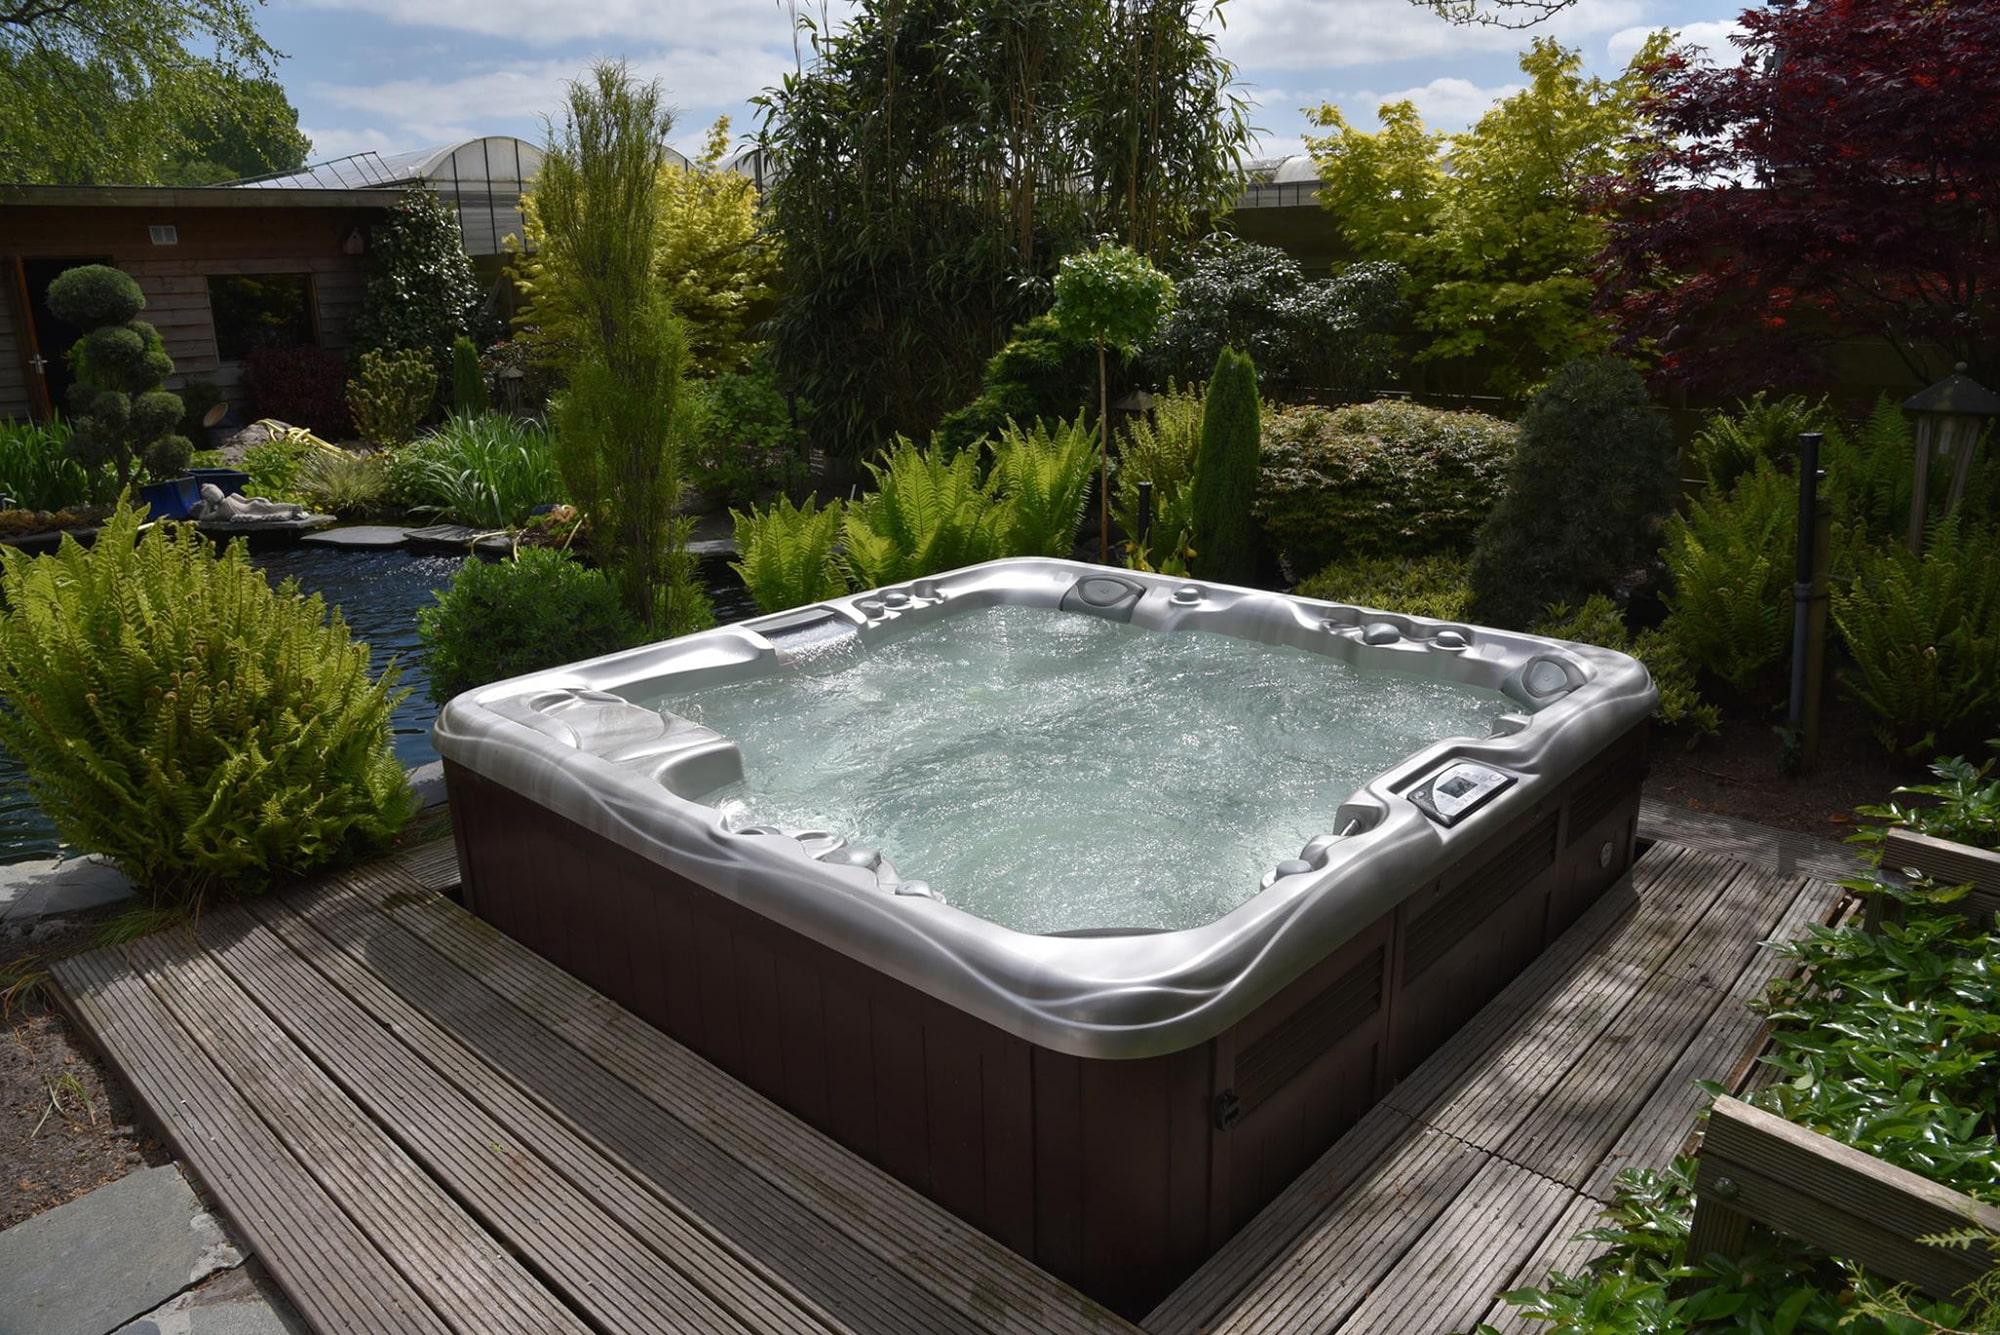 Sundance Spas hot tub install in New Jersey